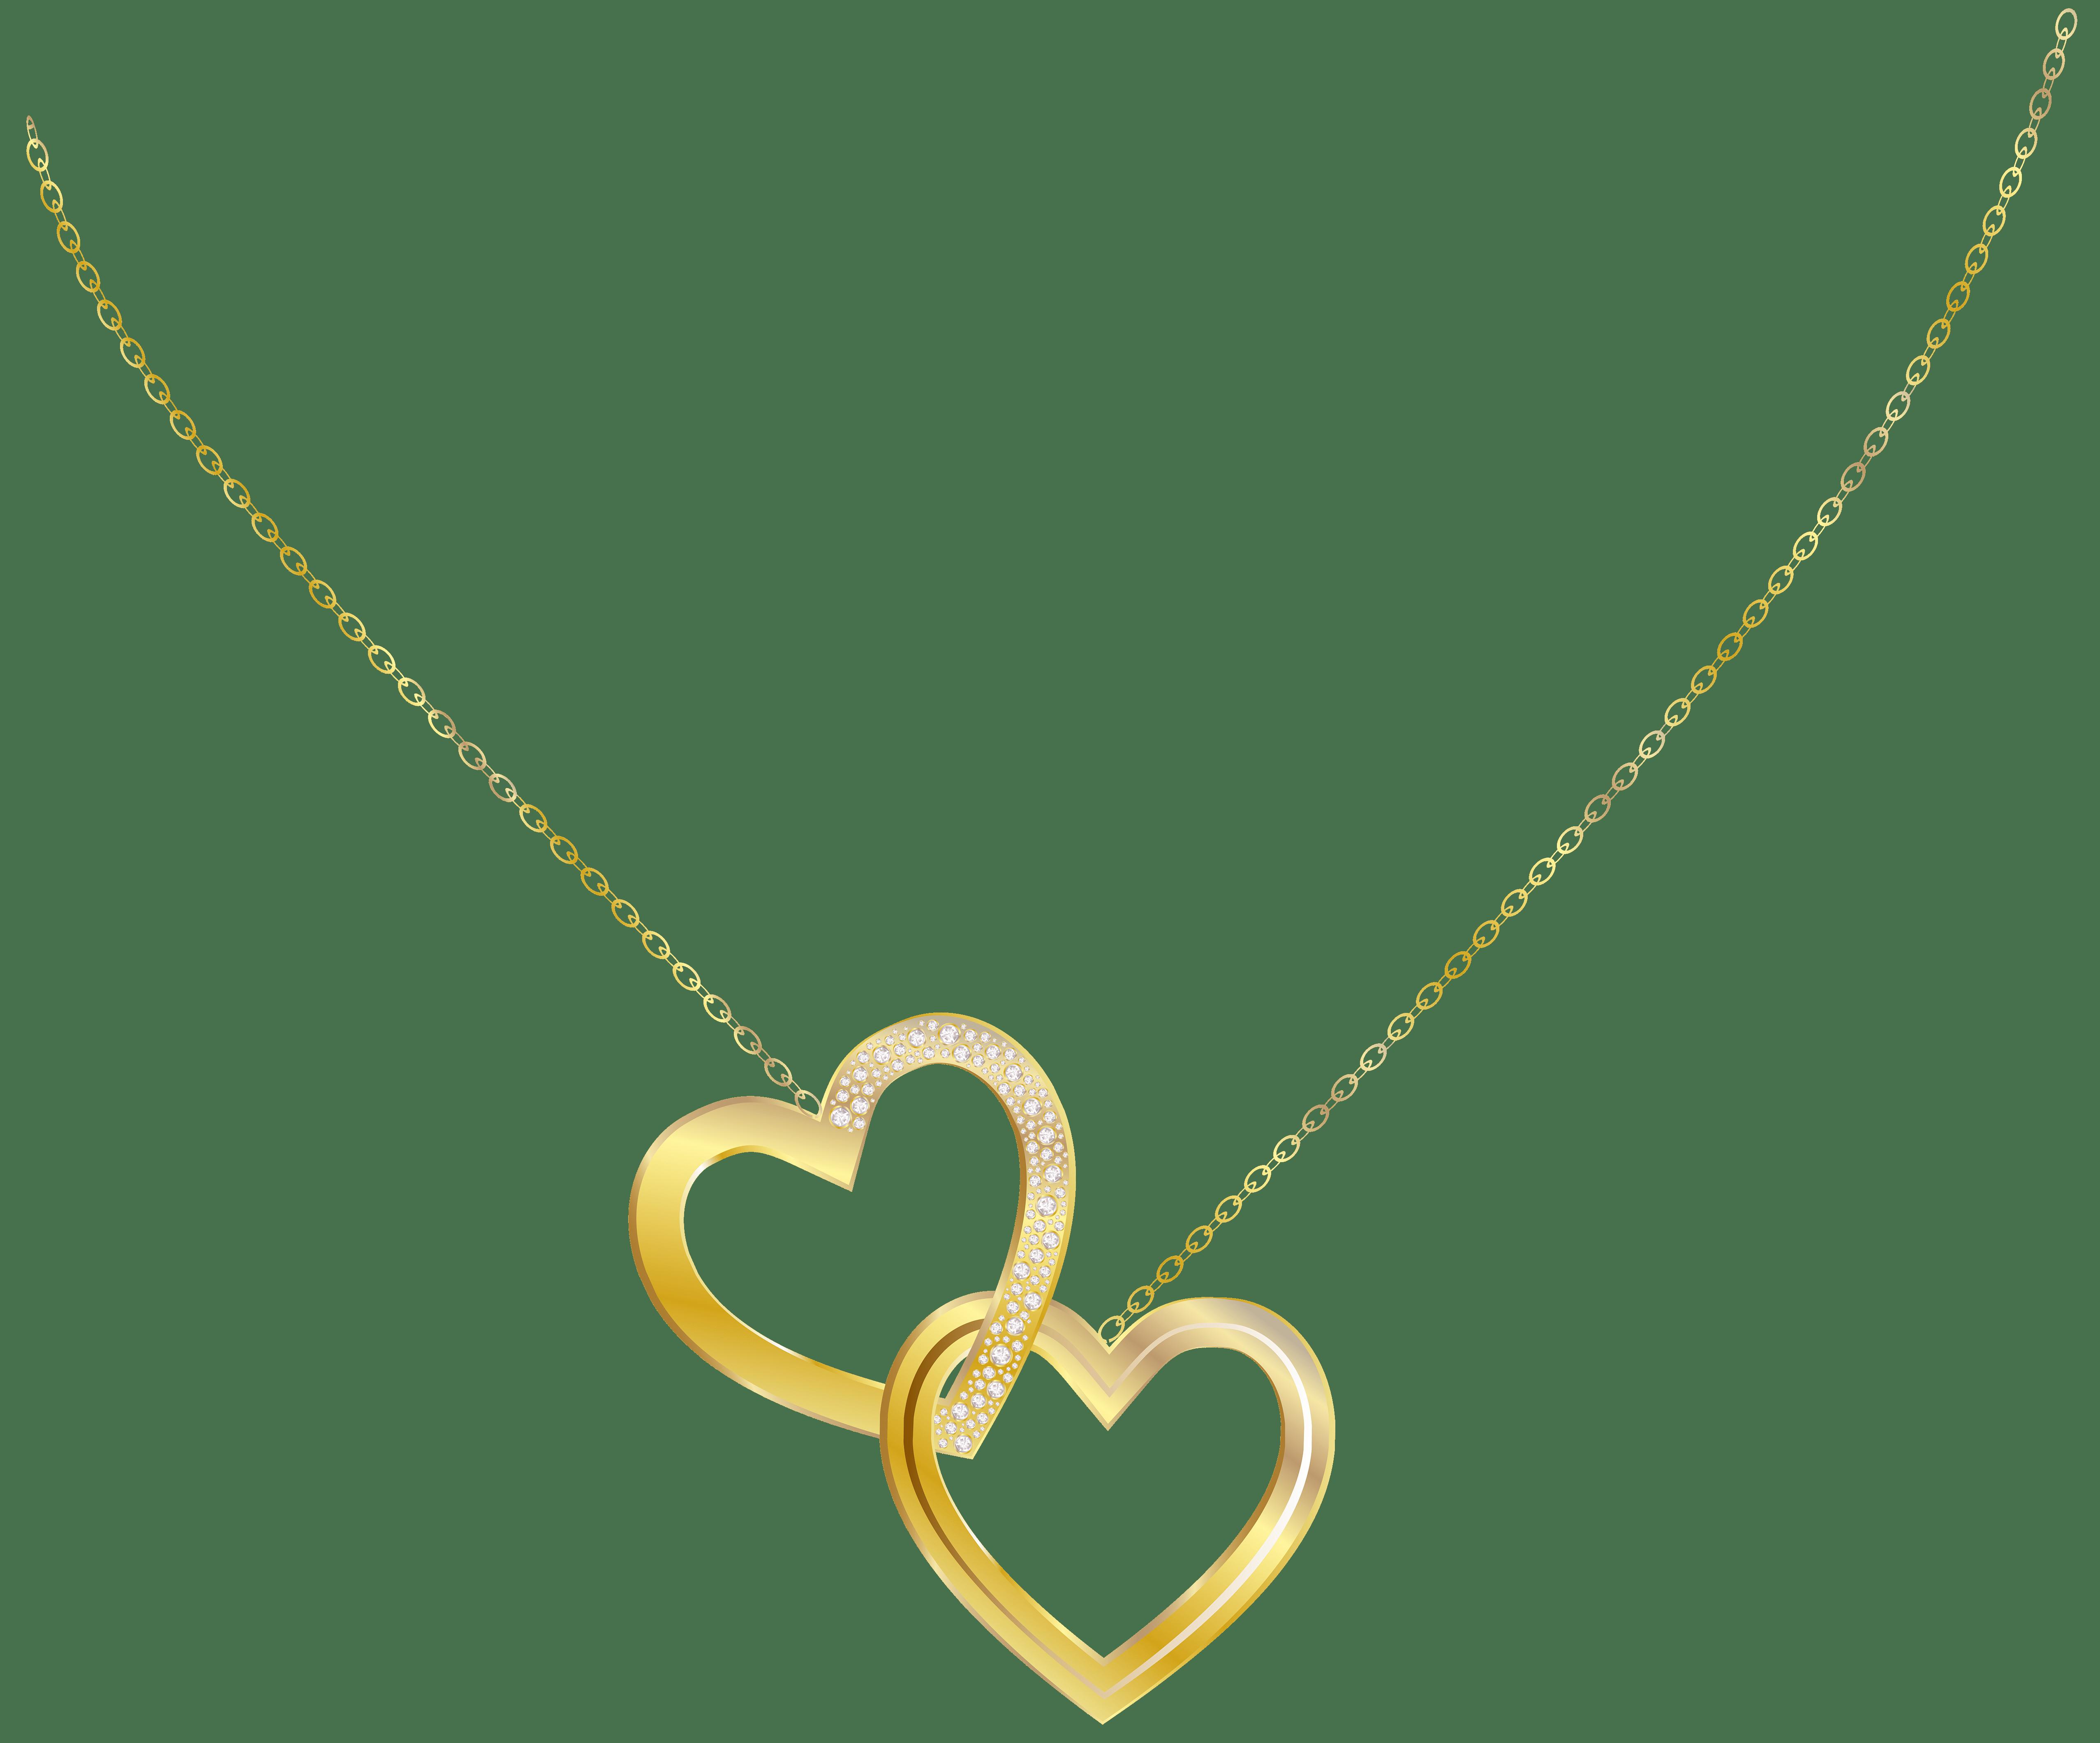 Clip art traumspuren jaxstormrealverseus. Necklace clipart round gold